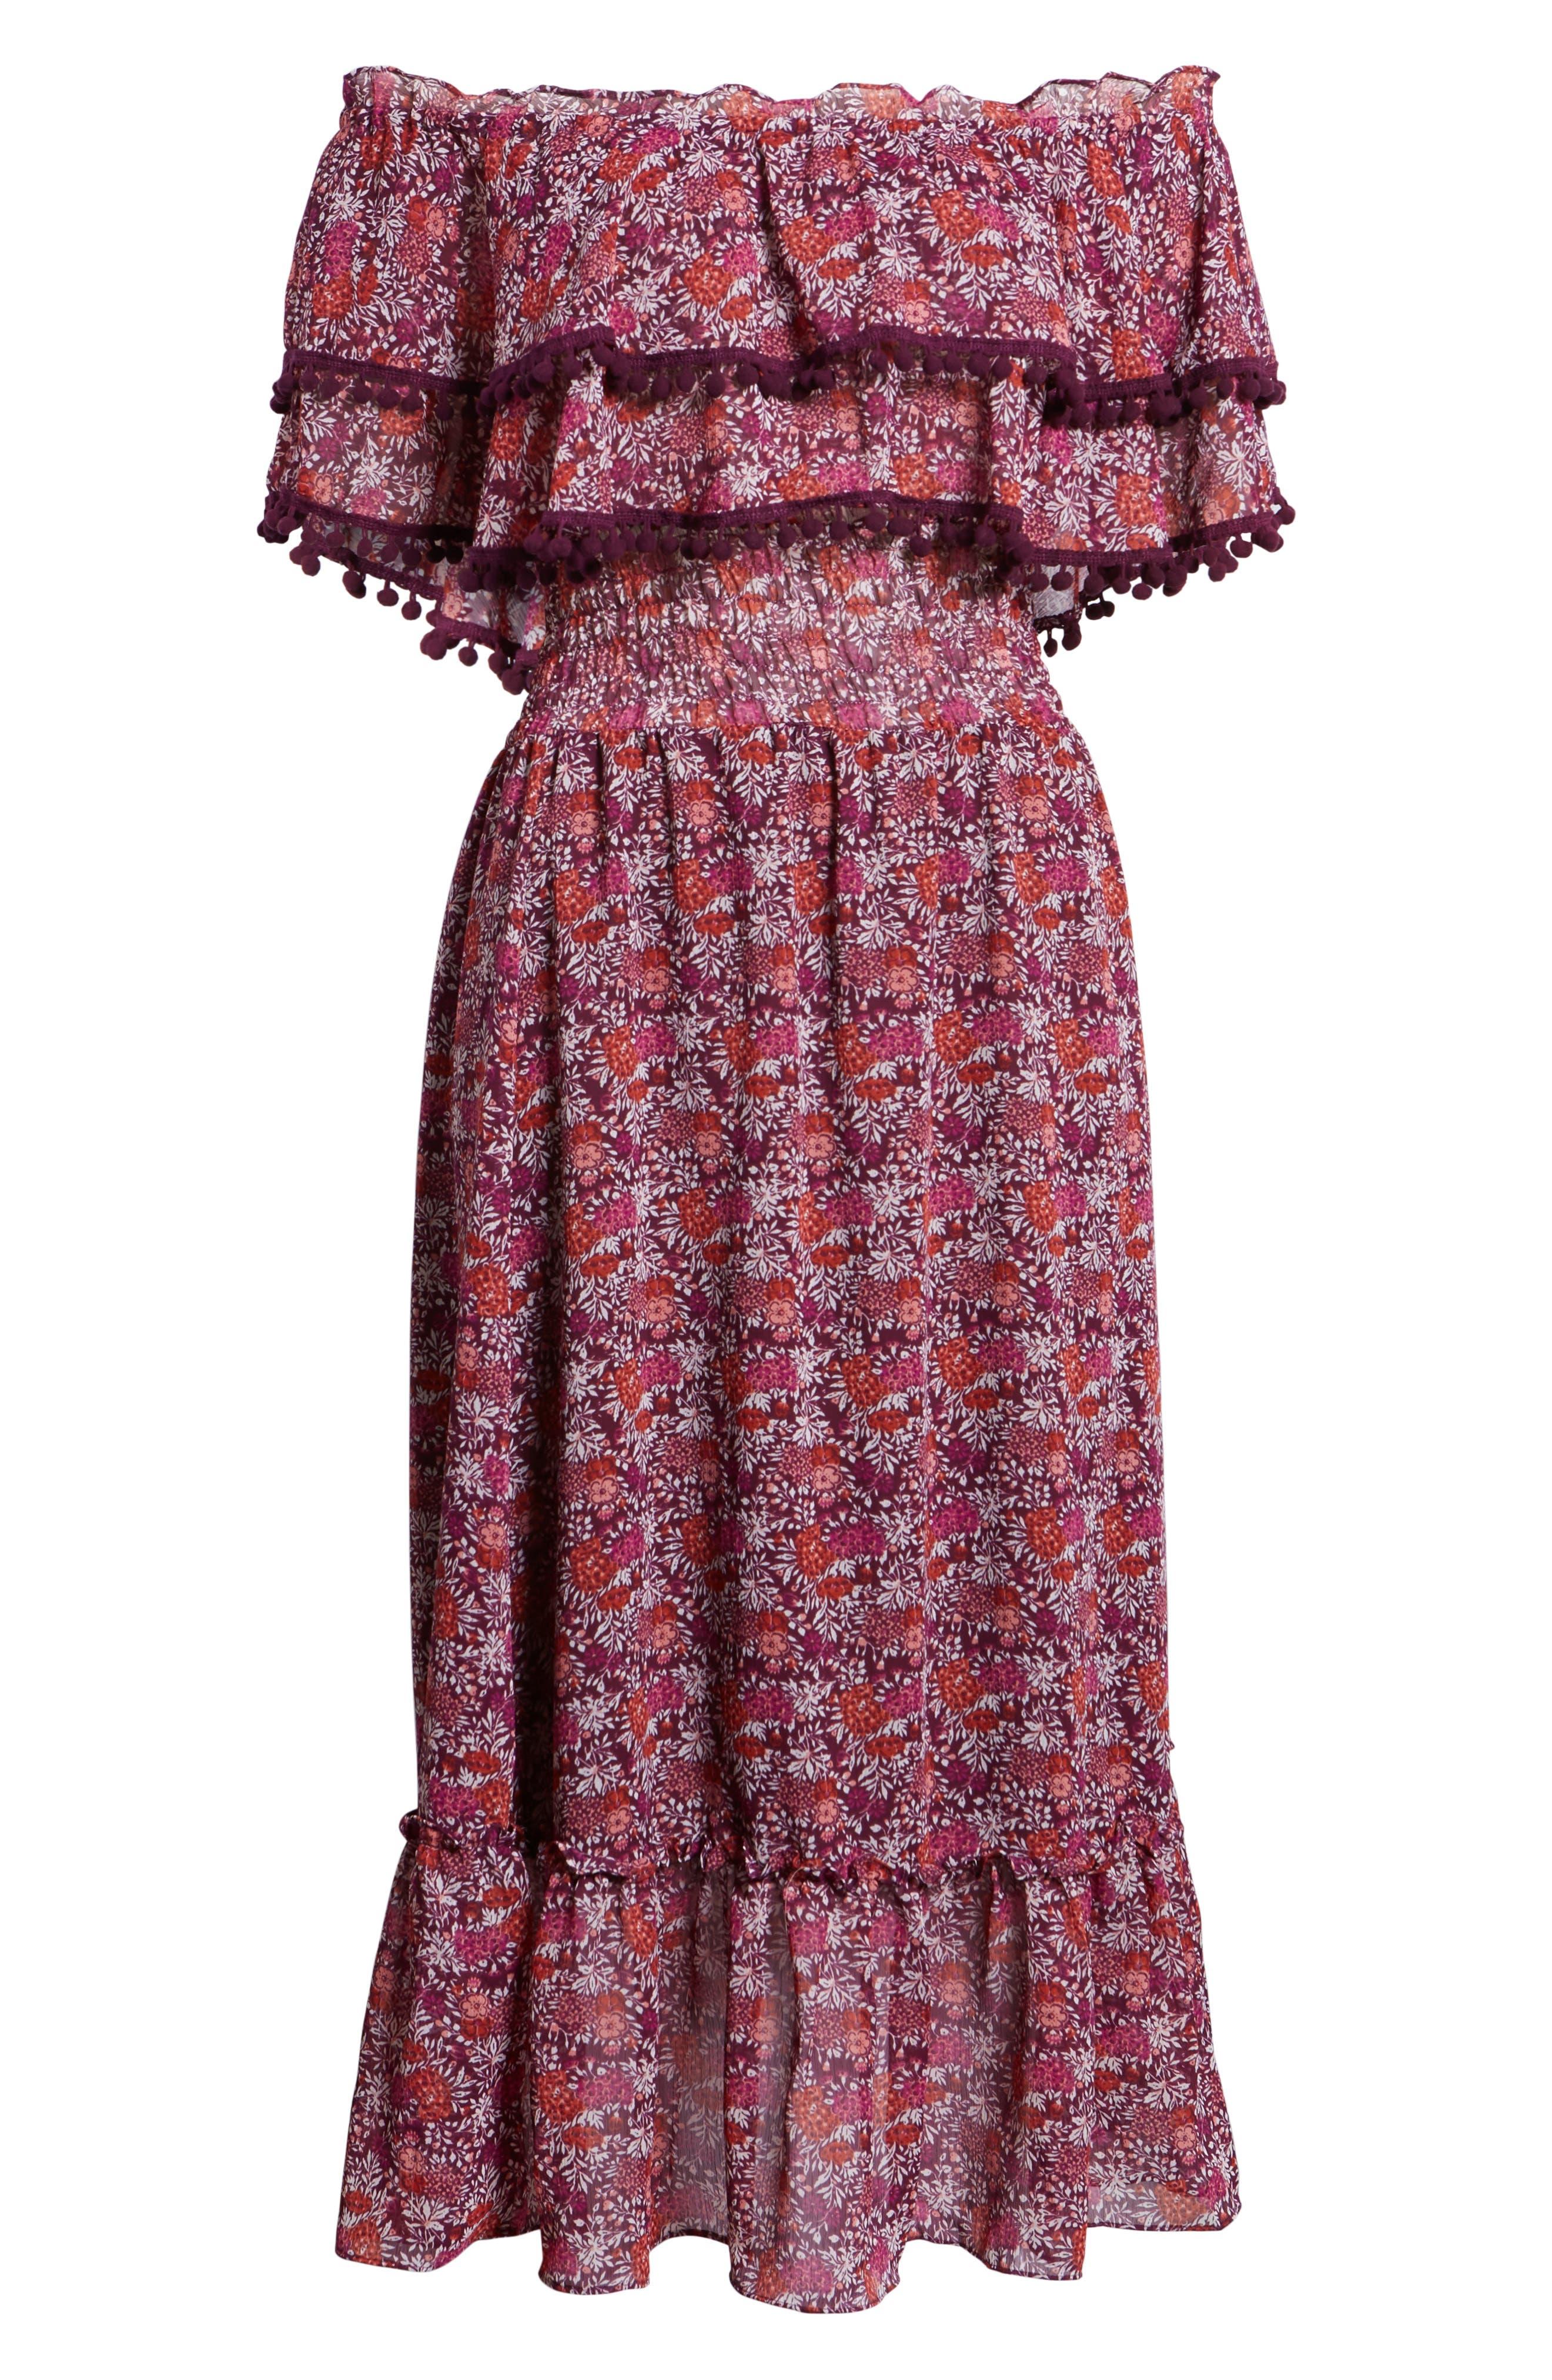 Maribel Off the Shoulder Midi Dress,                             Alternate thumbnail 7, color,                             930